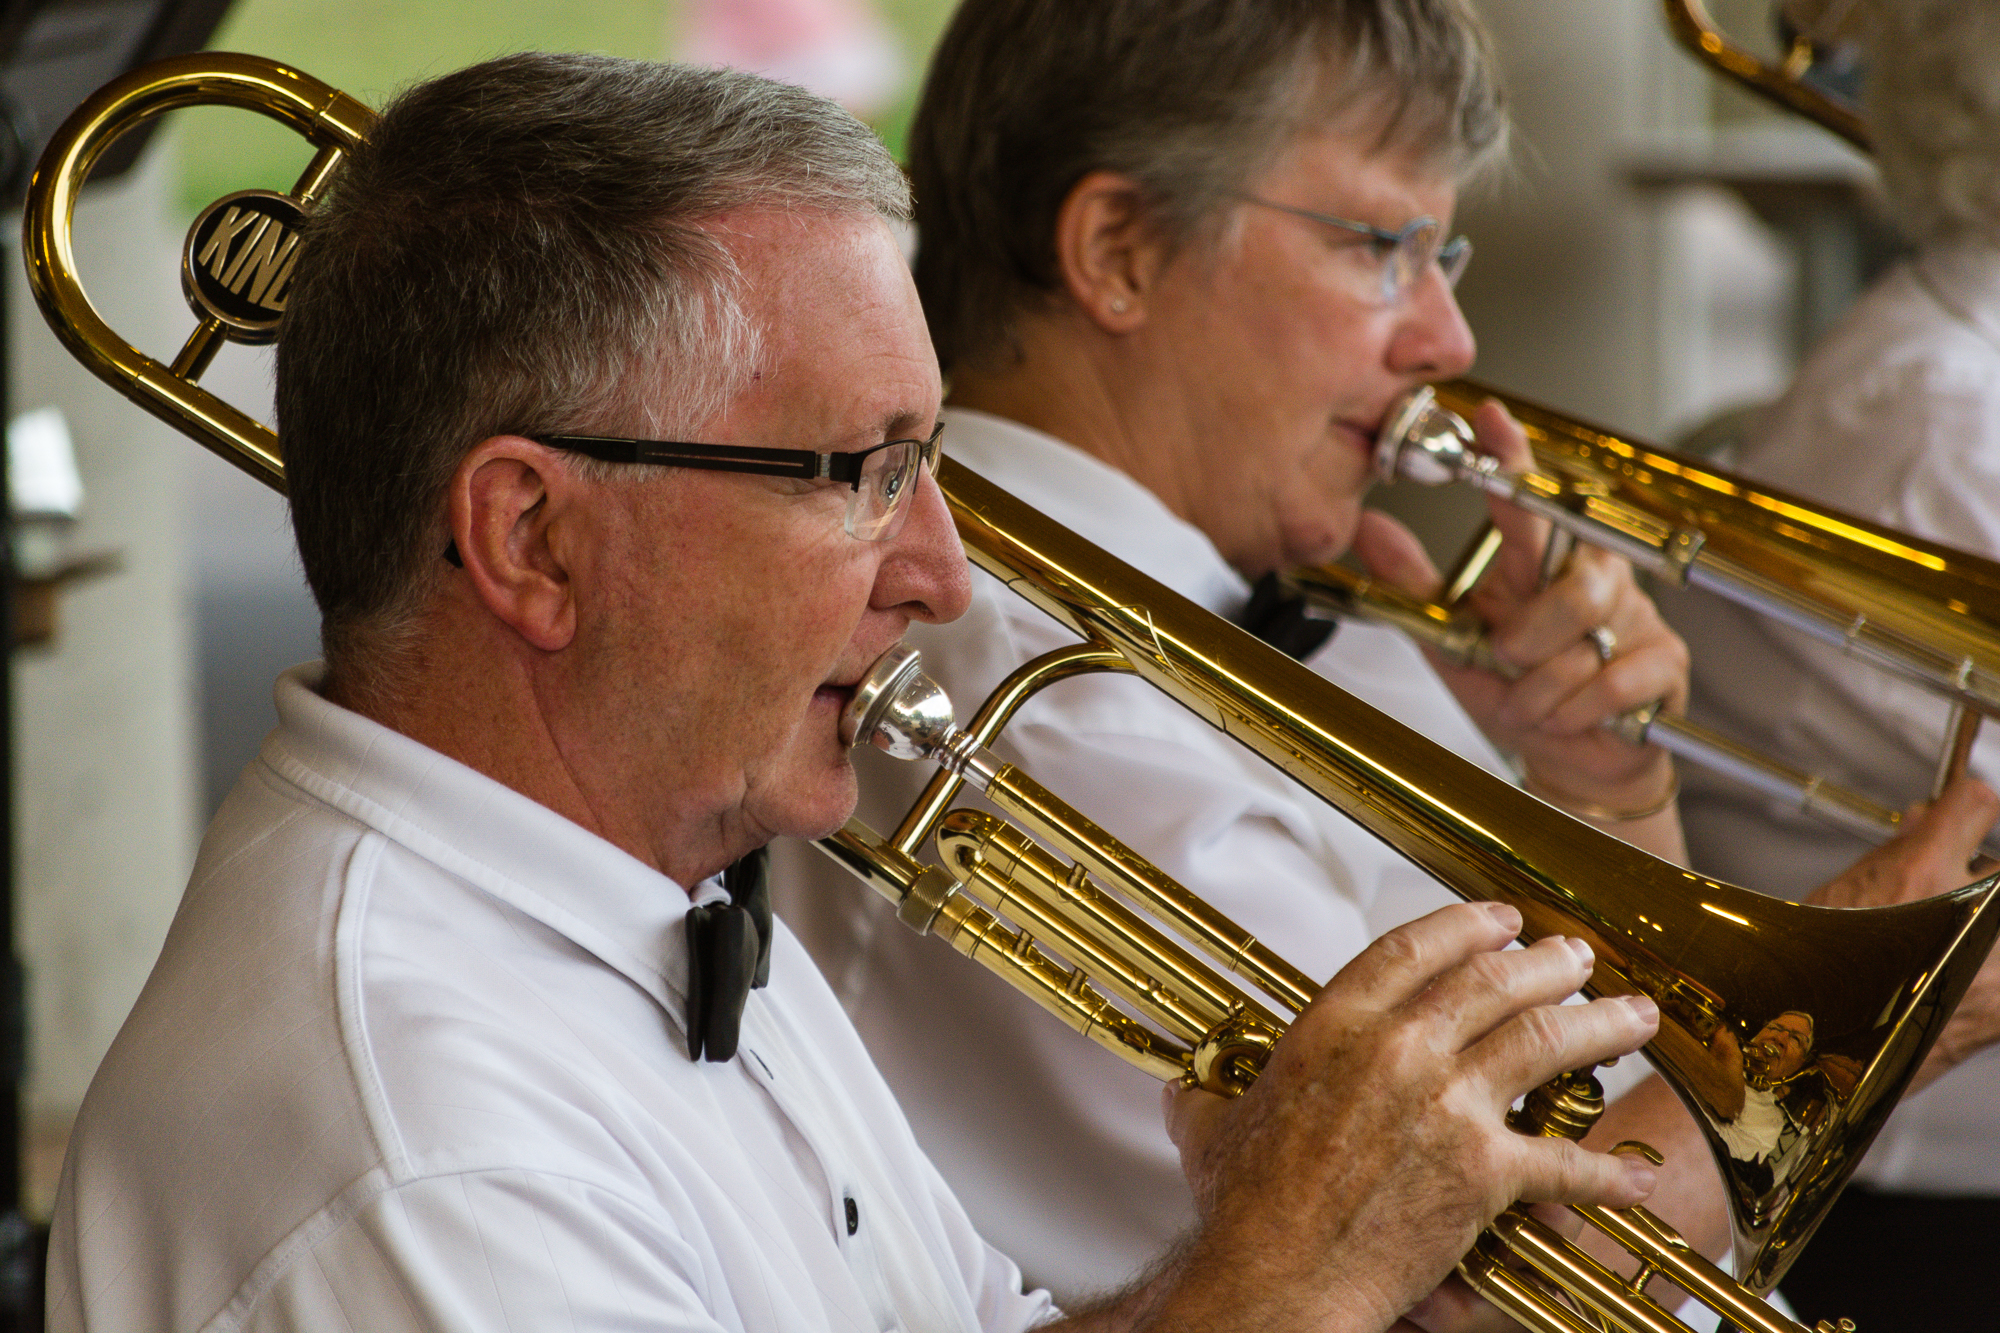 Lloyd Spalding - Trombone